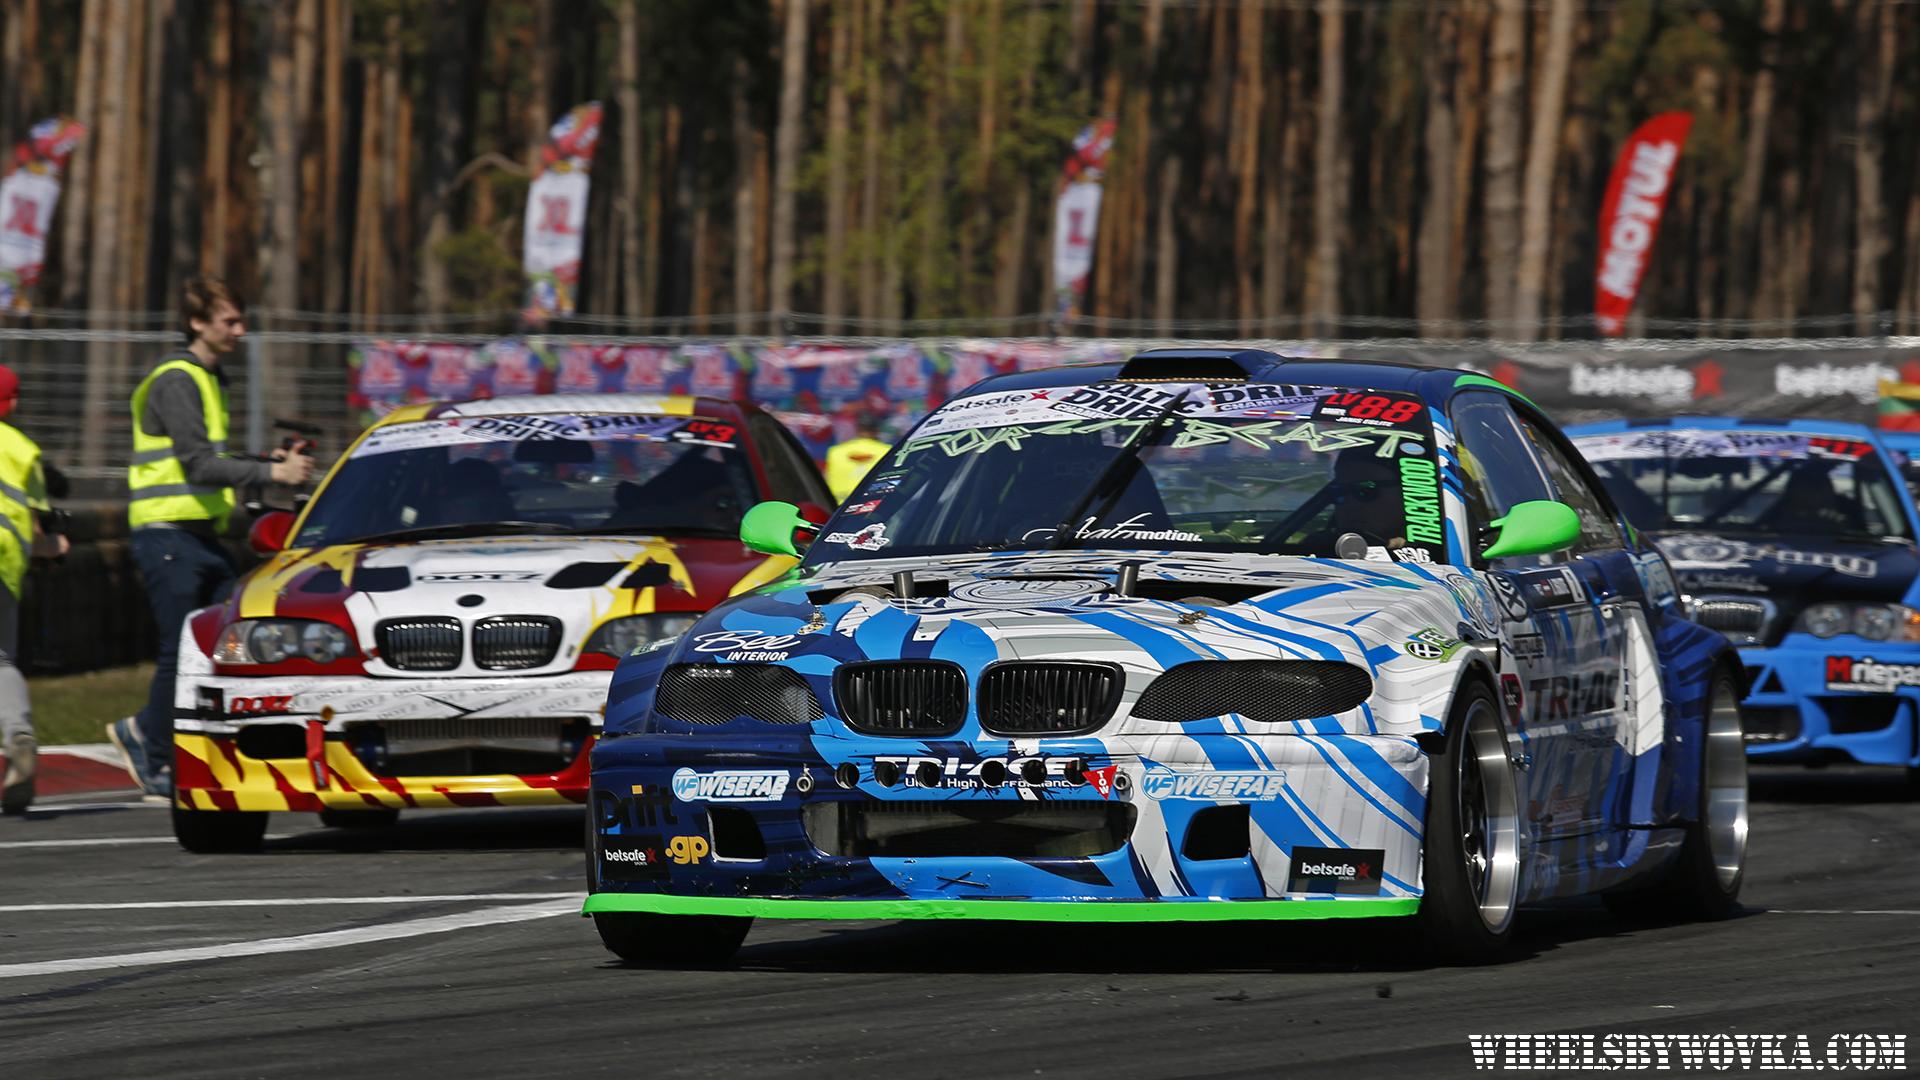 baltic-drift-championship-riga-by-wheelsbywovka-5